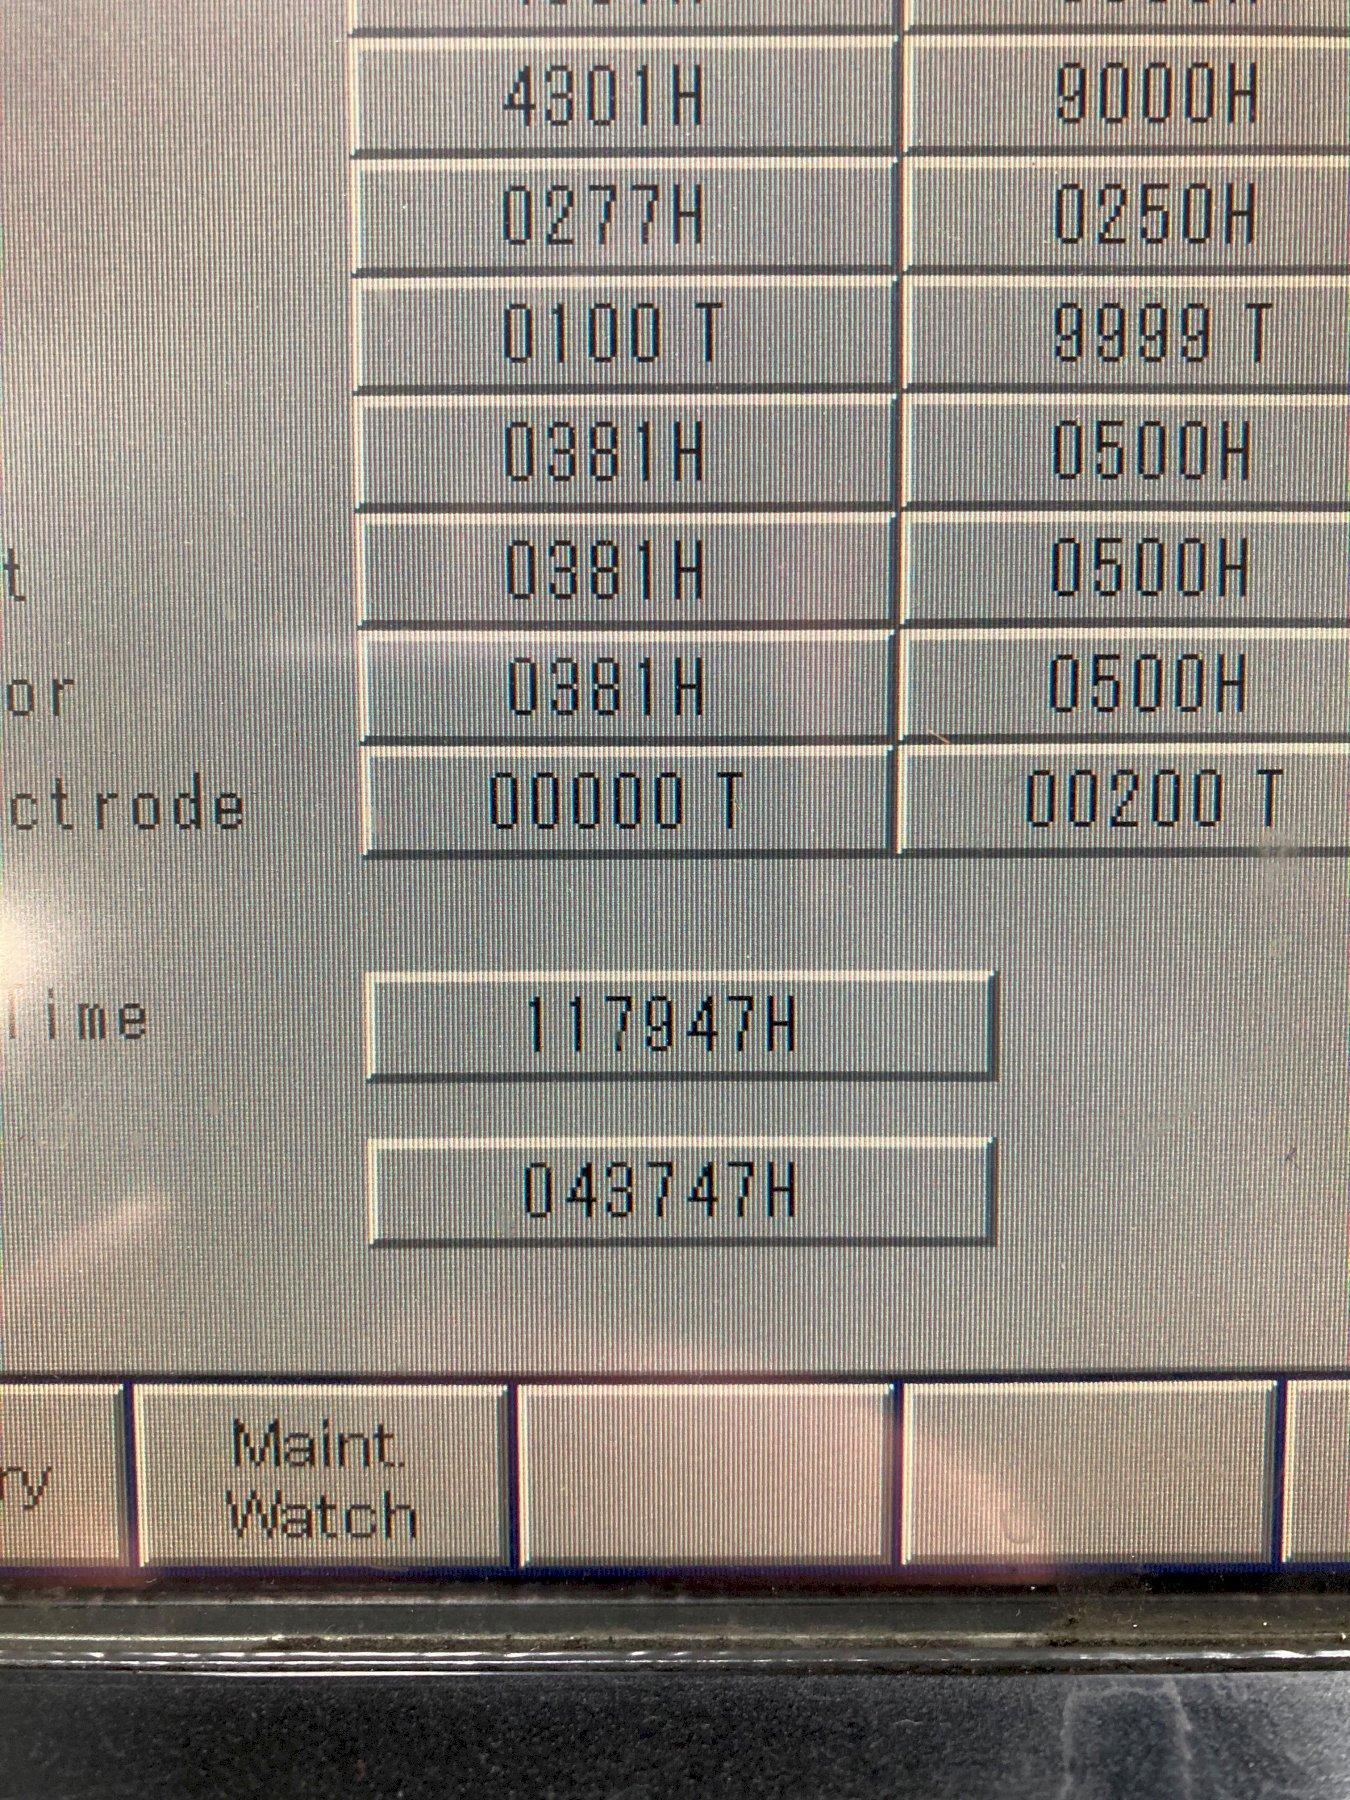 "Sodick AQ537L CNC Wire EDM, LQ33W Control, 22""/15""/14"" Travels, Auto Threading, Submerged Cutting, Linear Motors, Glass Scales, 3300 Lb Capacity, 2007"